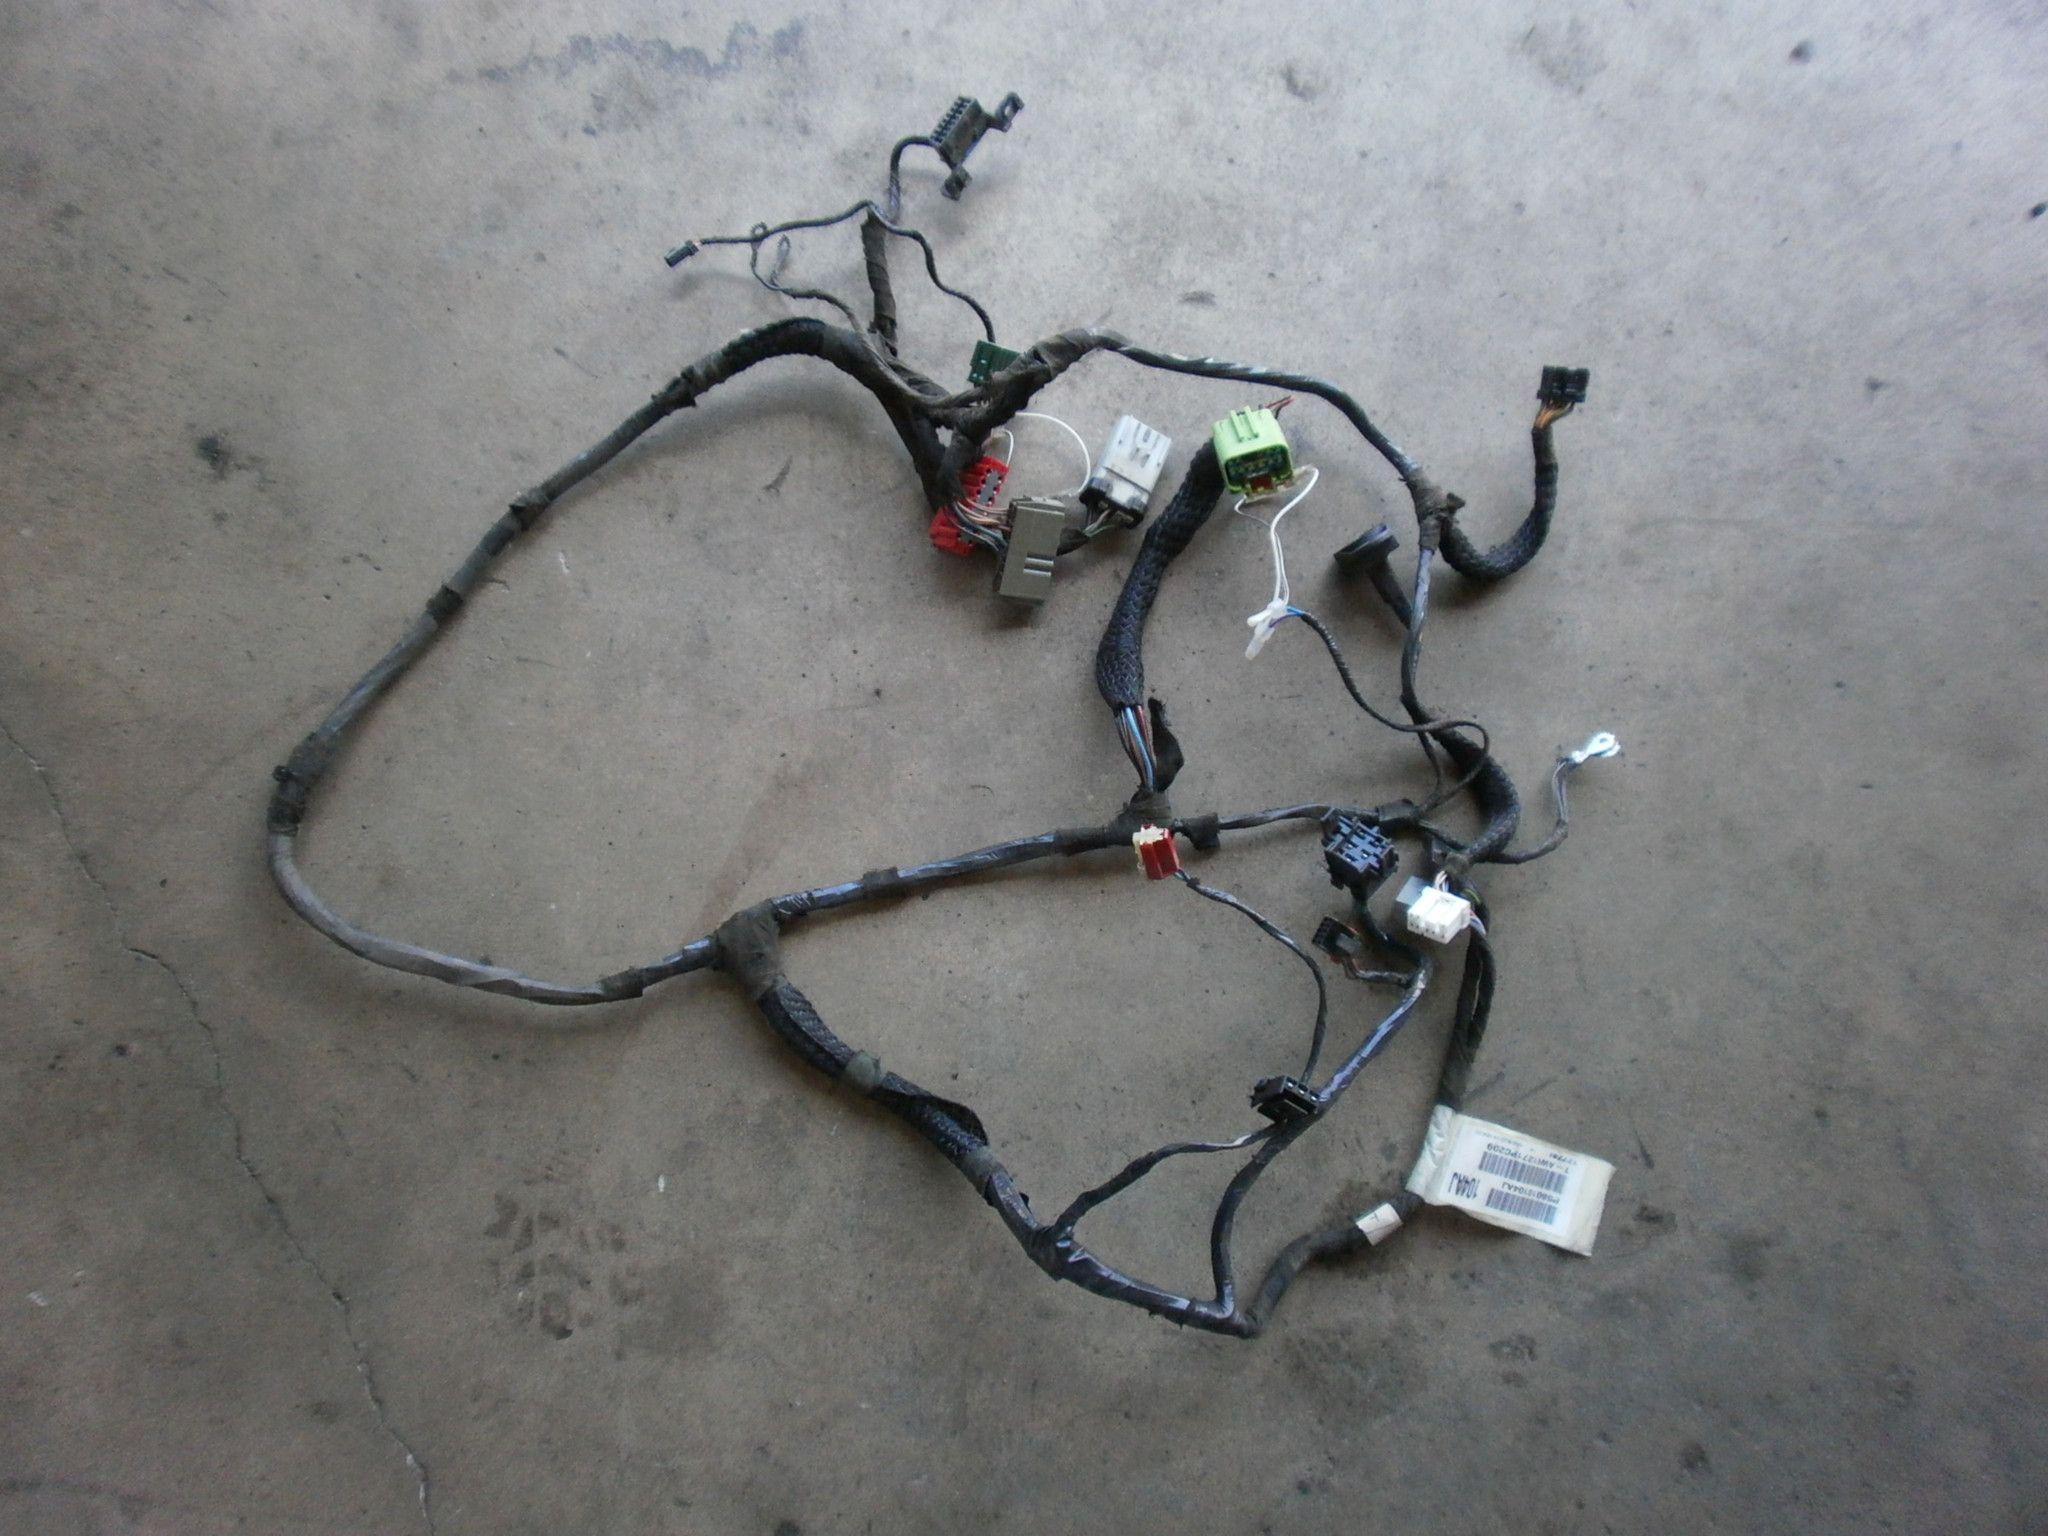 medium resolution of jeep wrangler tj instrument panel wiring harness 2001 p56010104aj oem good used 2 4 4 0